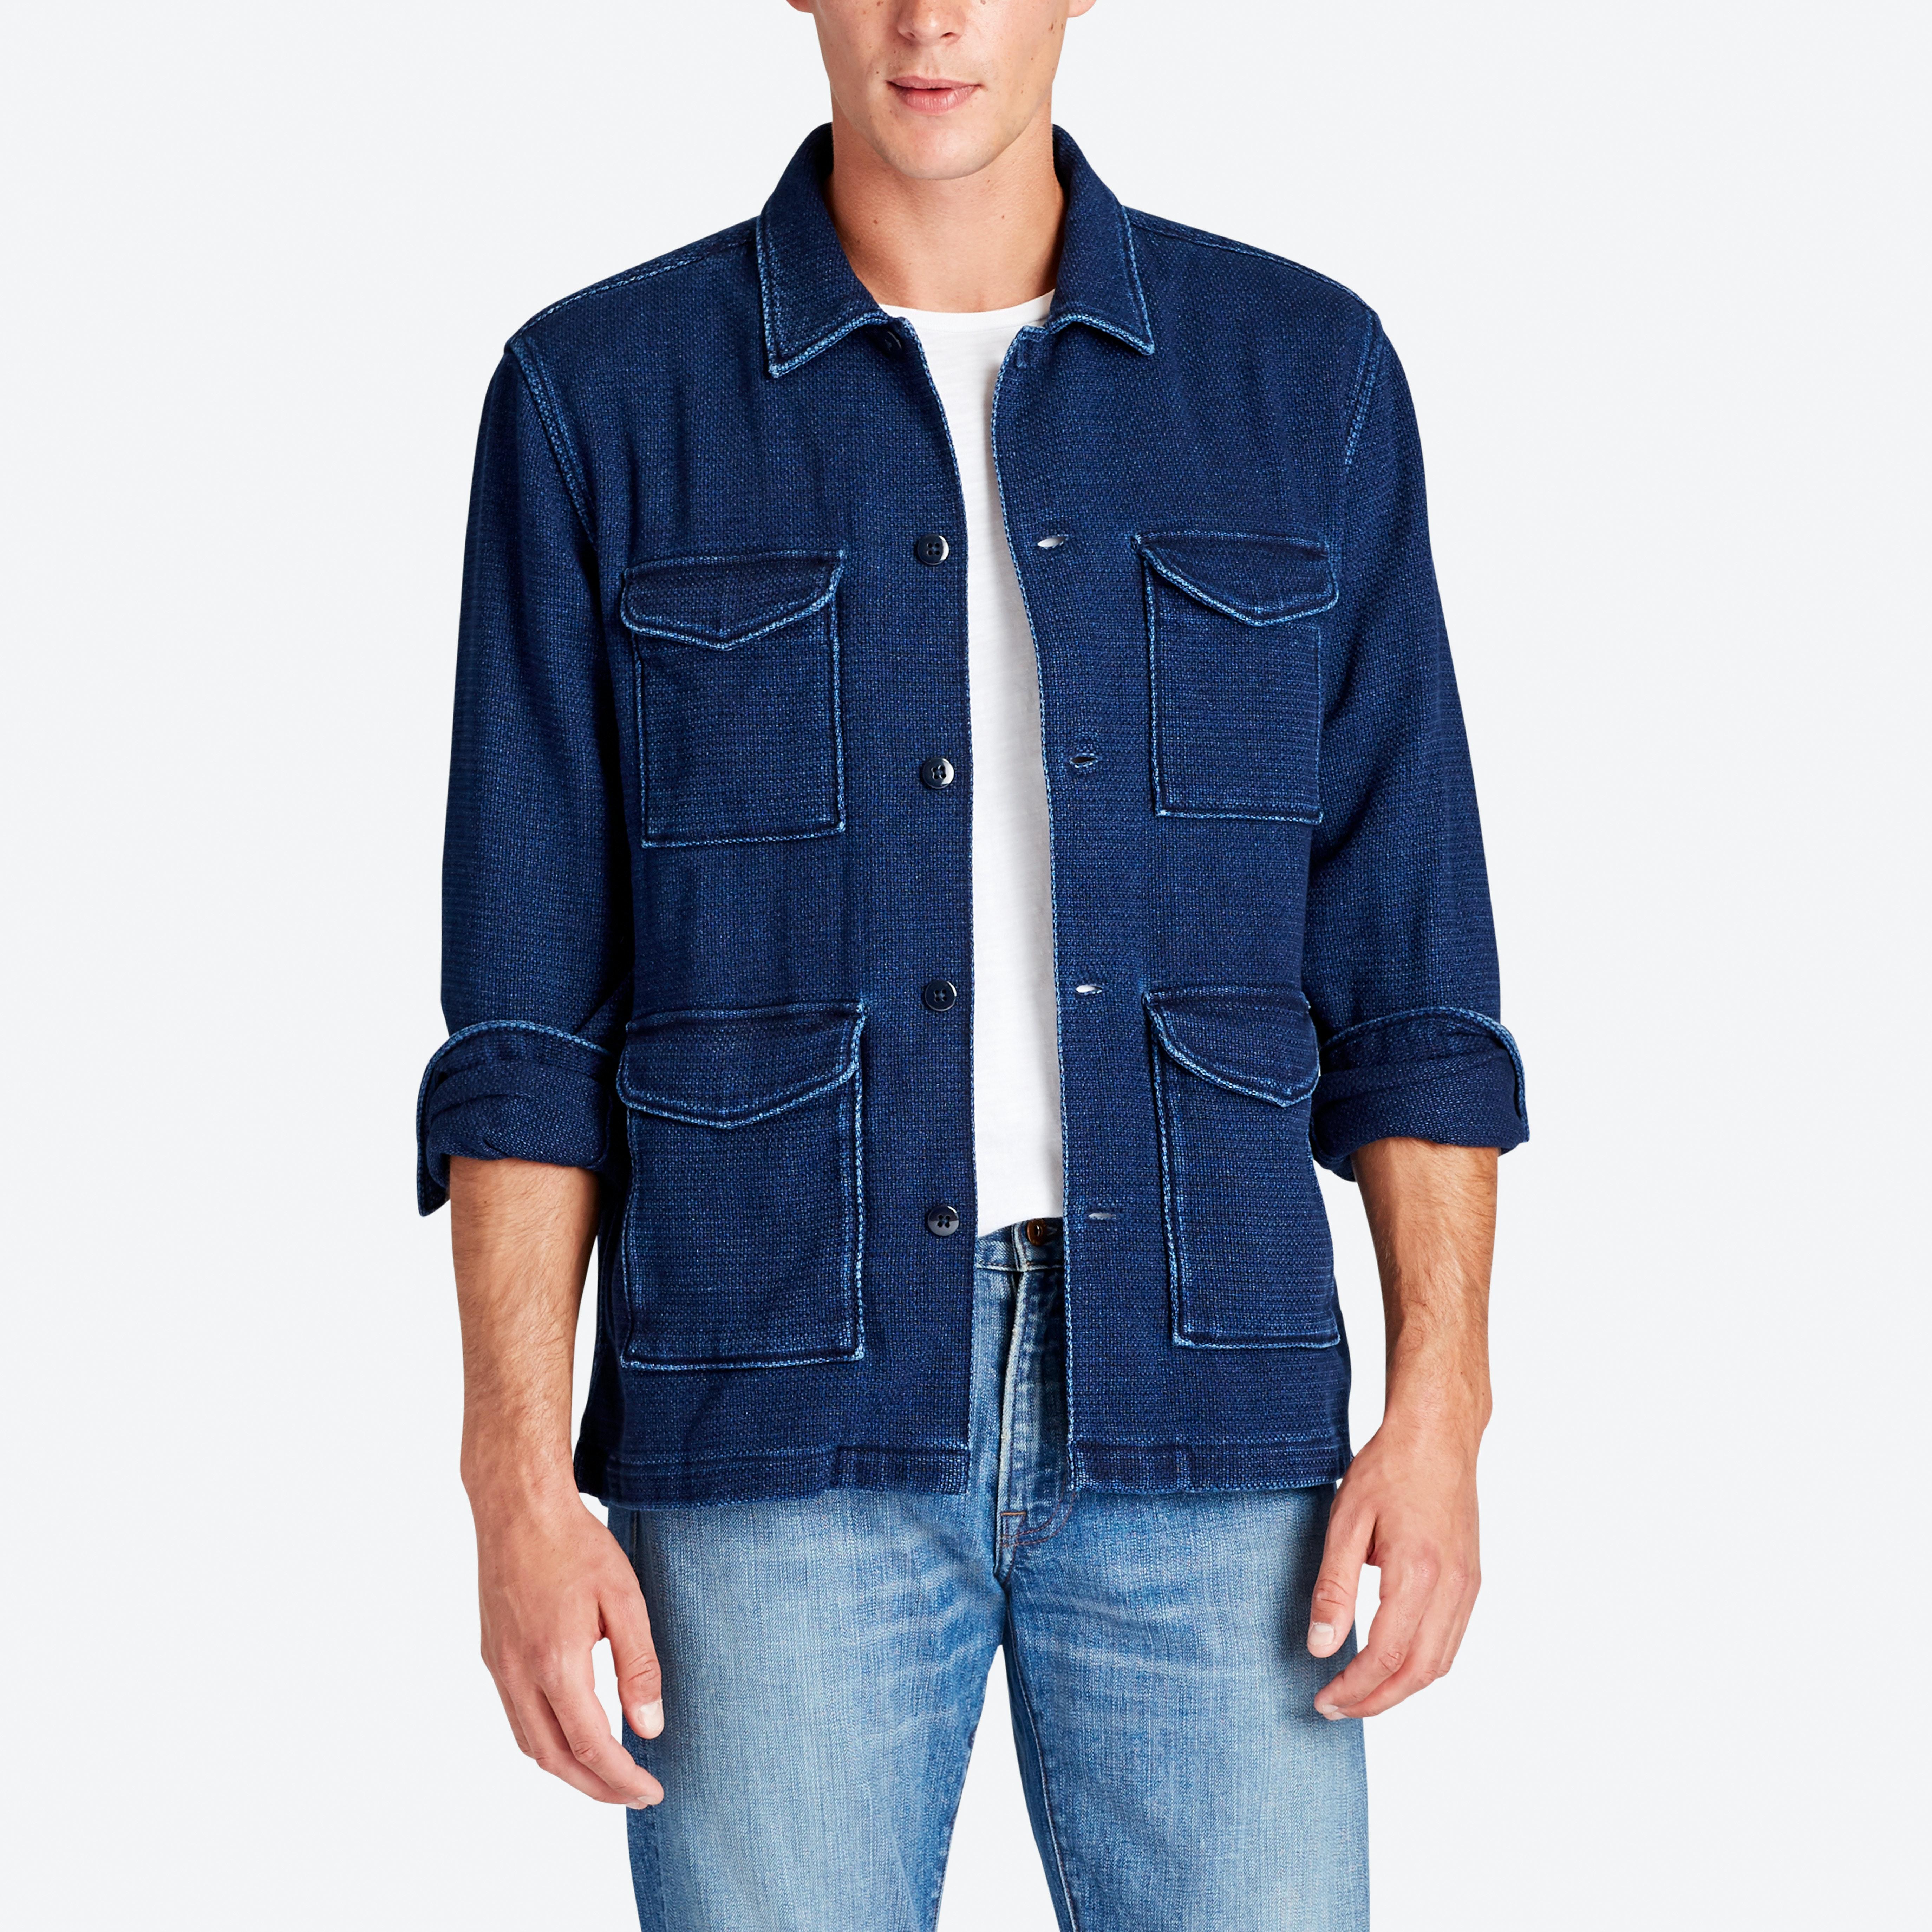 Men\u0027s Shirts - Casual, Dress, Tees, Sweaters \u0026 Active wear | Bonobos